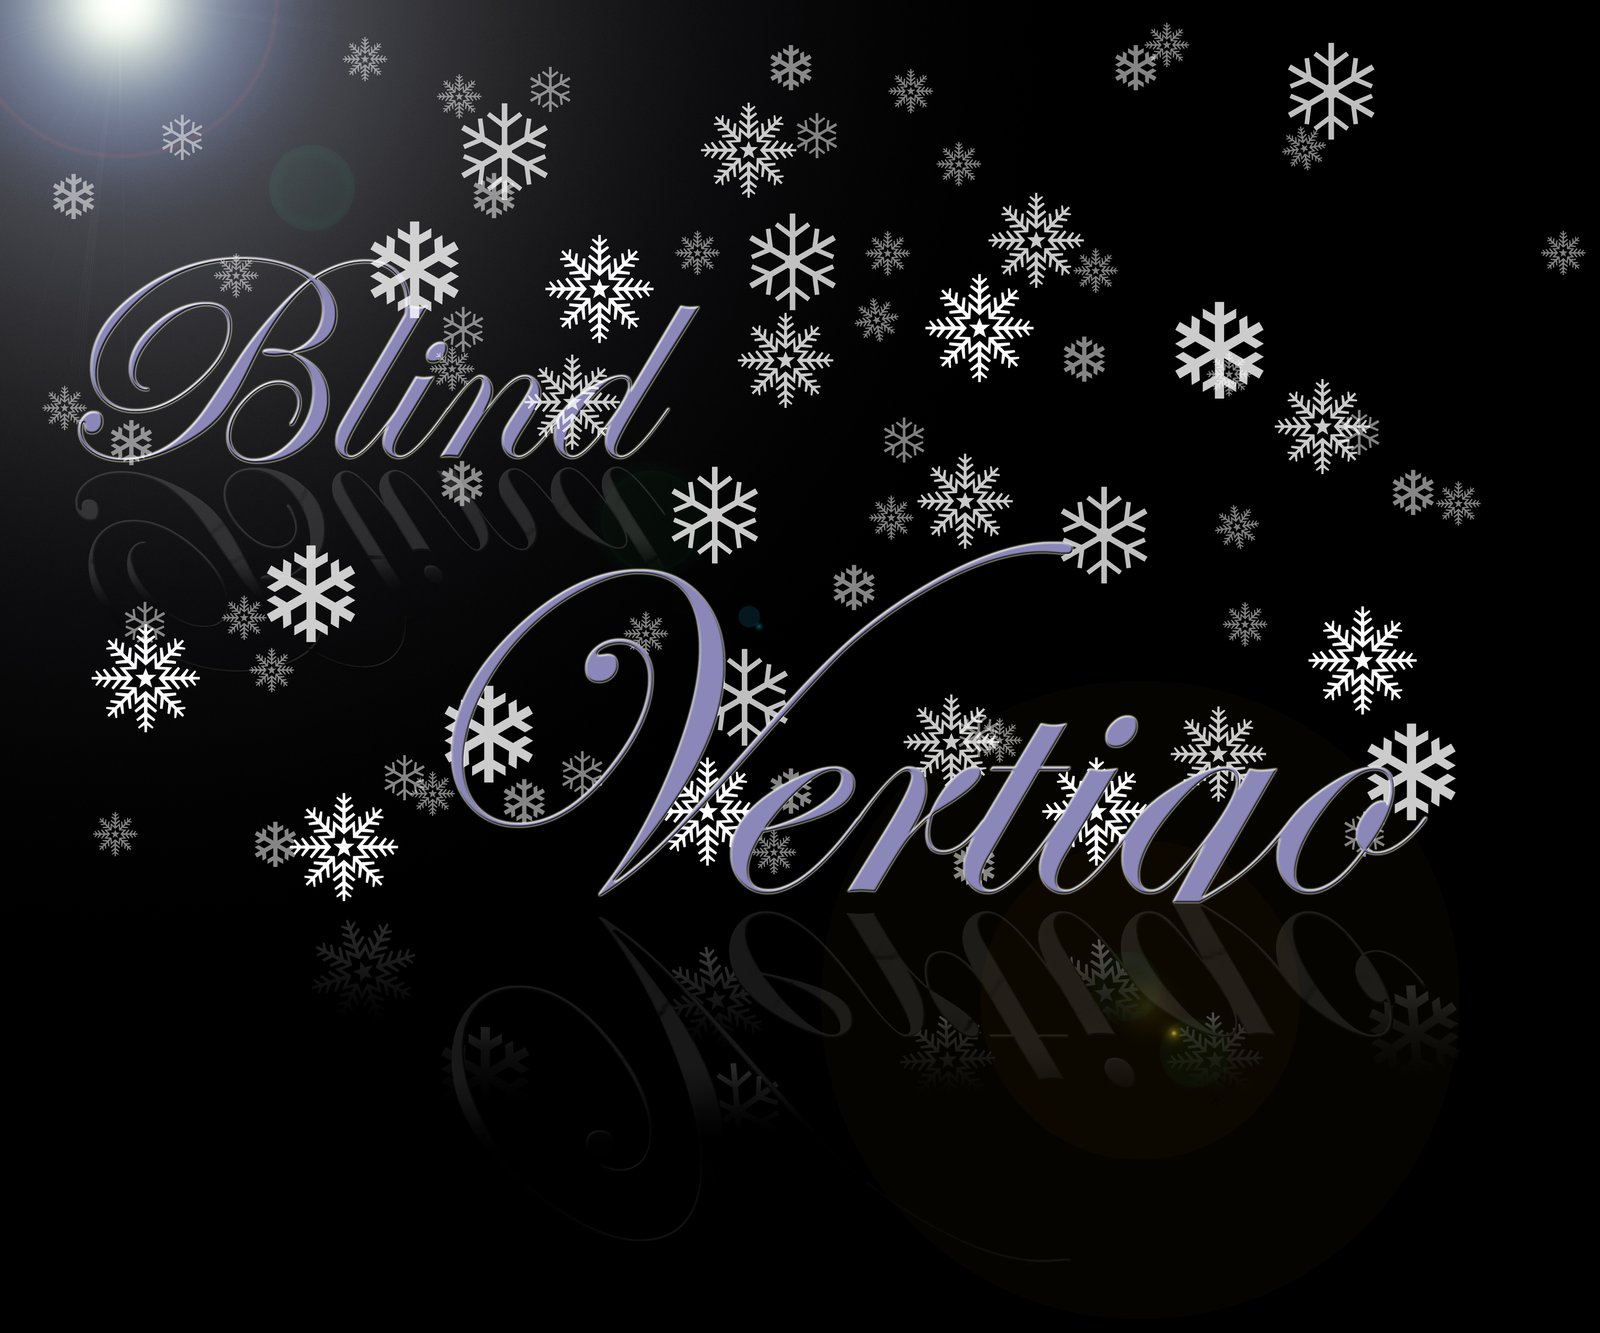 Blind Vertigo